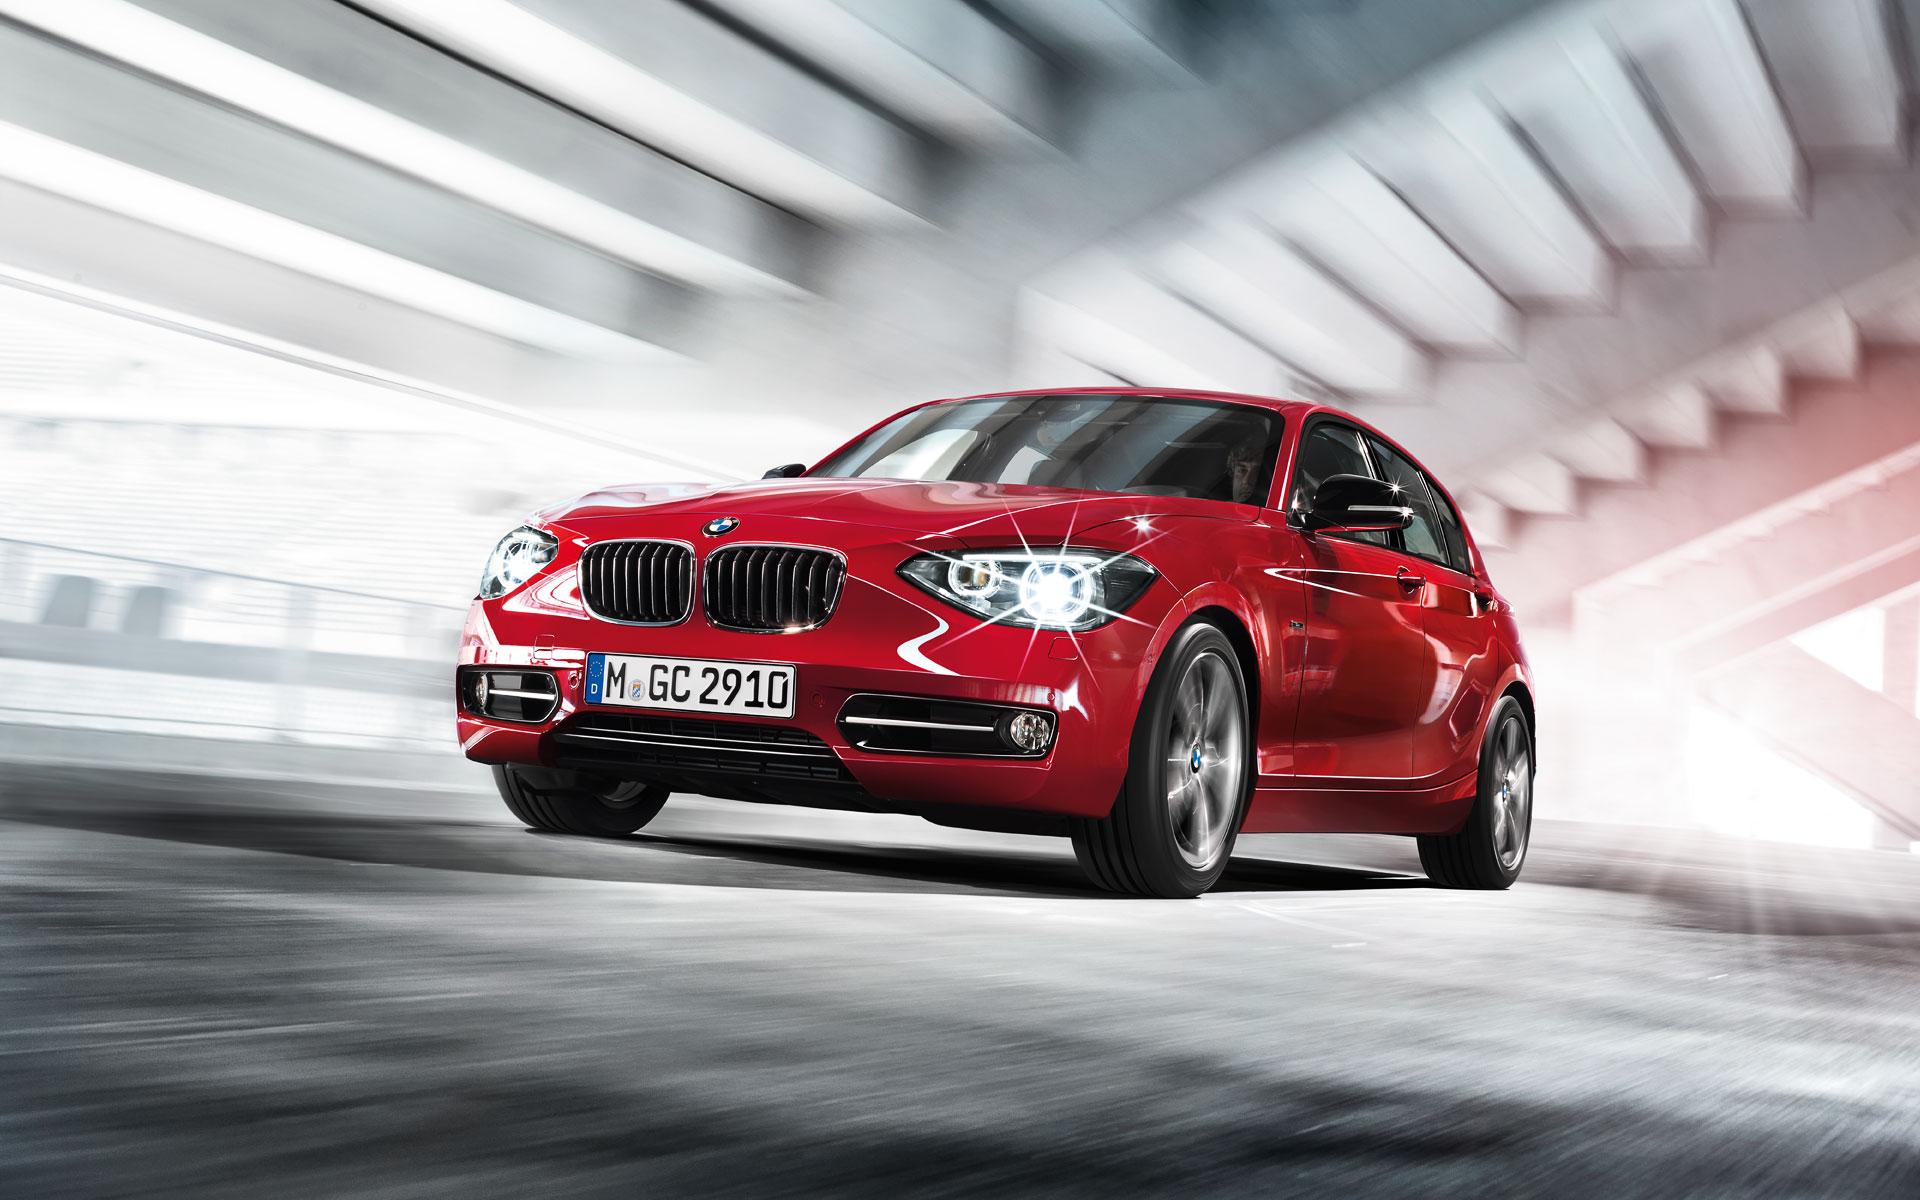 BMW_1series_wallpaper_05_1920_1200.jpg.resource.1373895744115.jpg